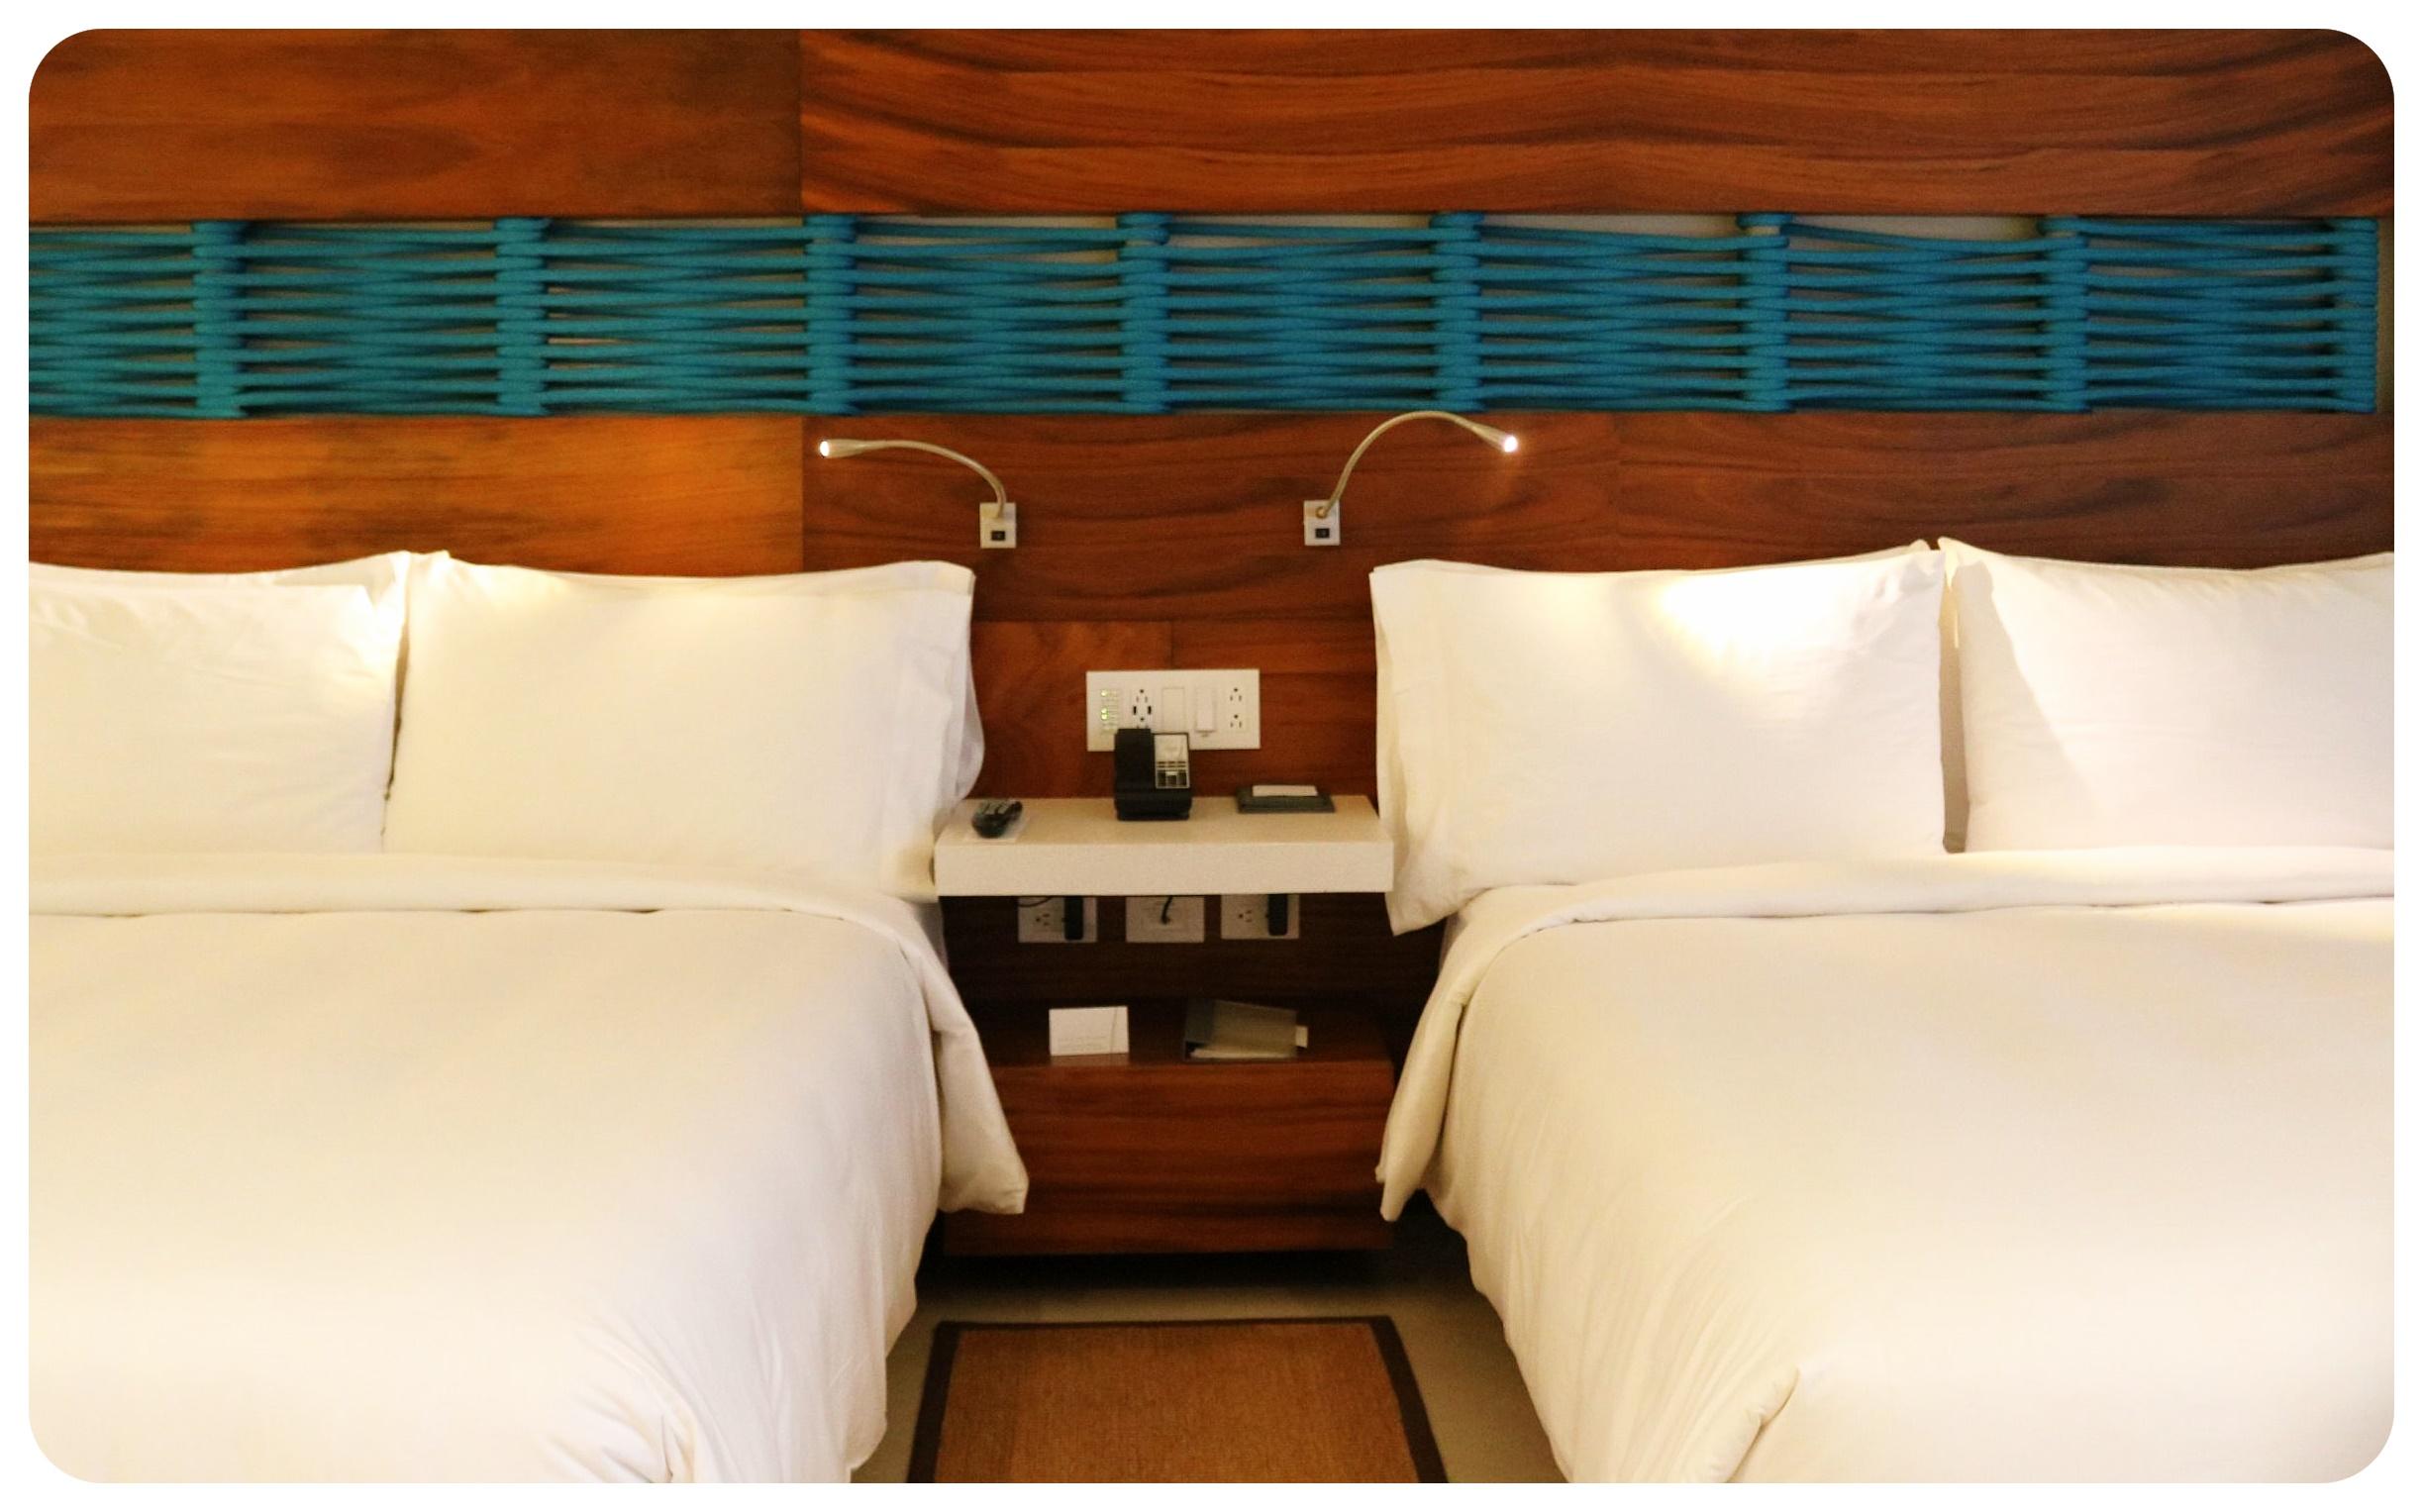 grand hyatt playa del carmen beds